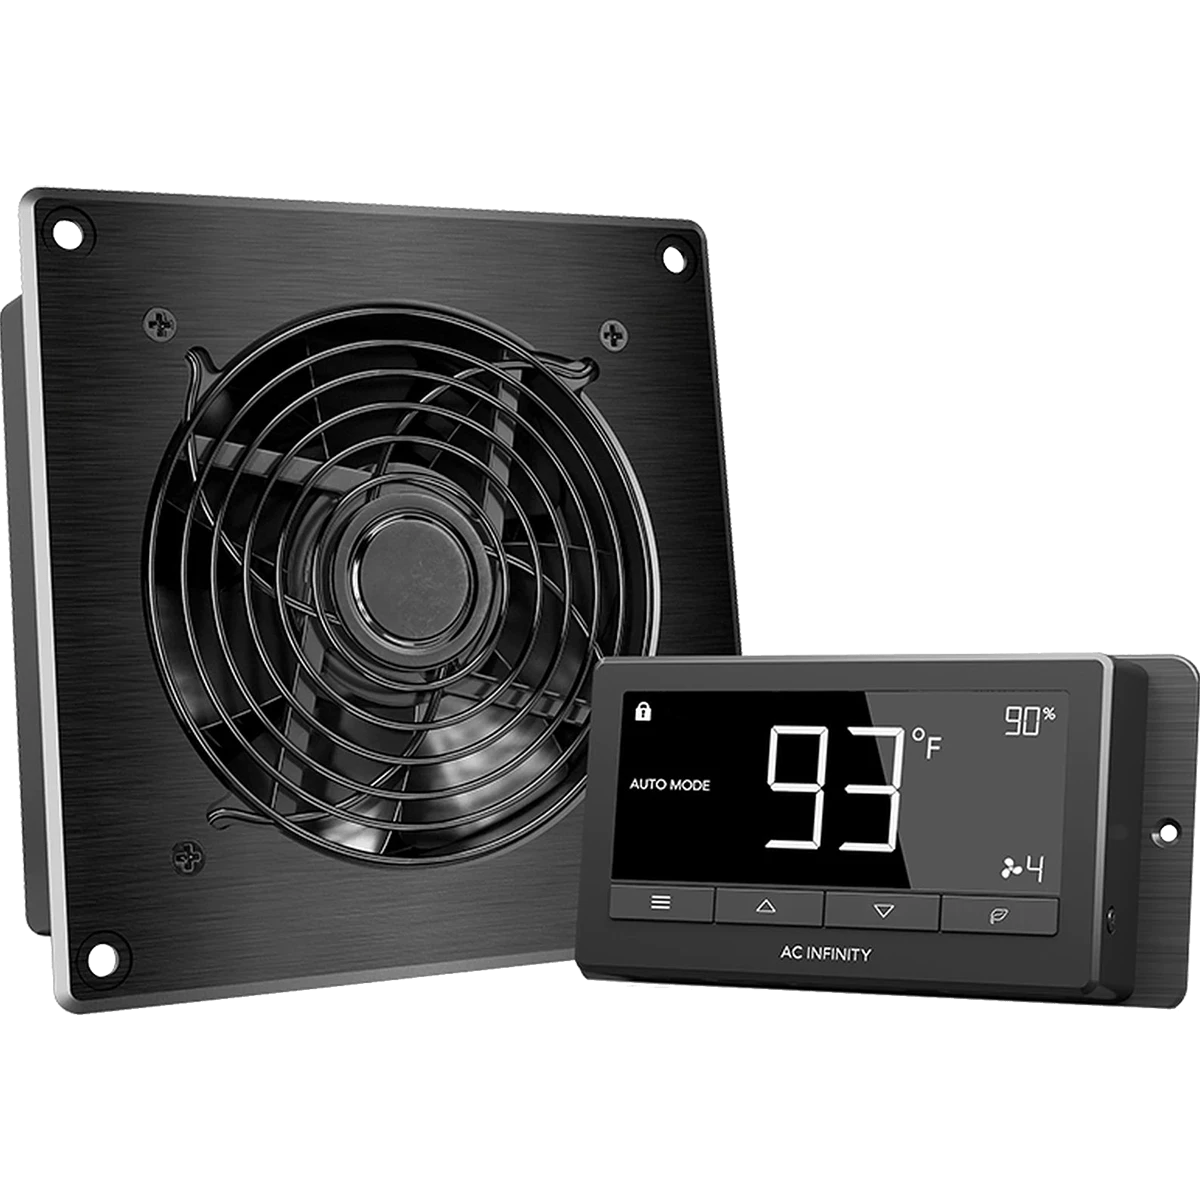 ac infinity airtitan t3 6 in ventilation fan w temperature humidity controller